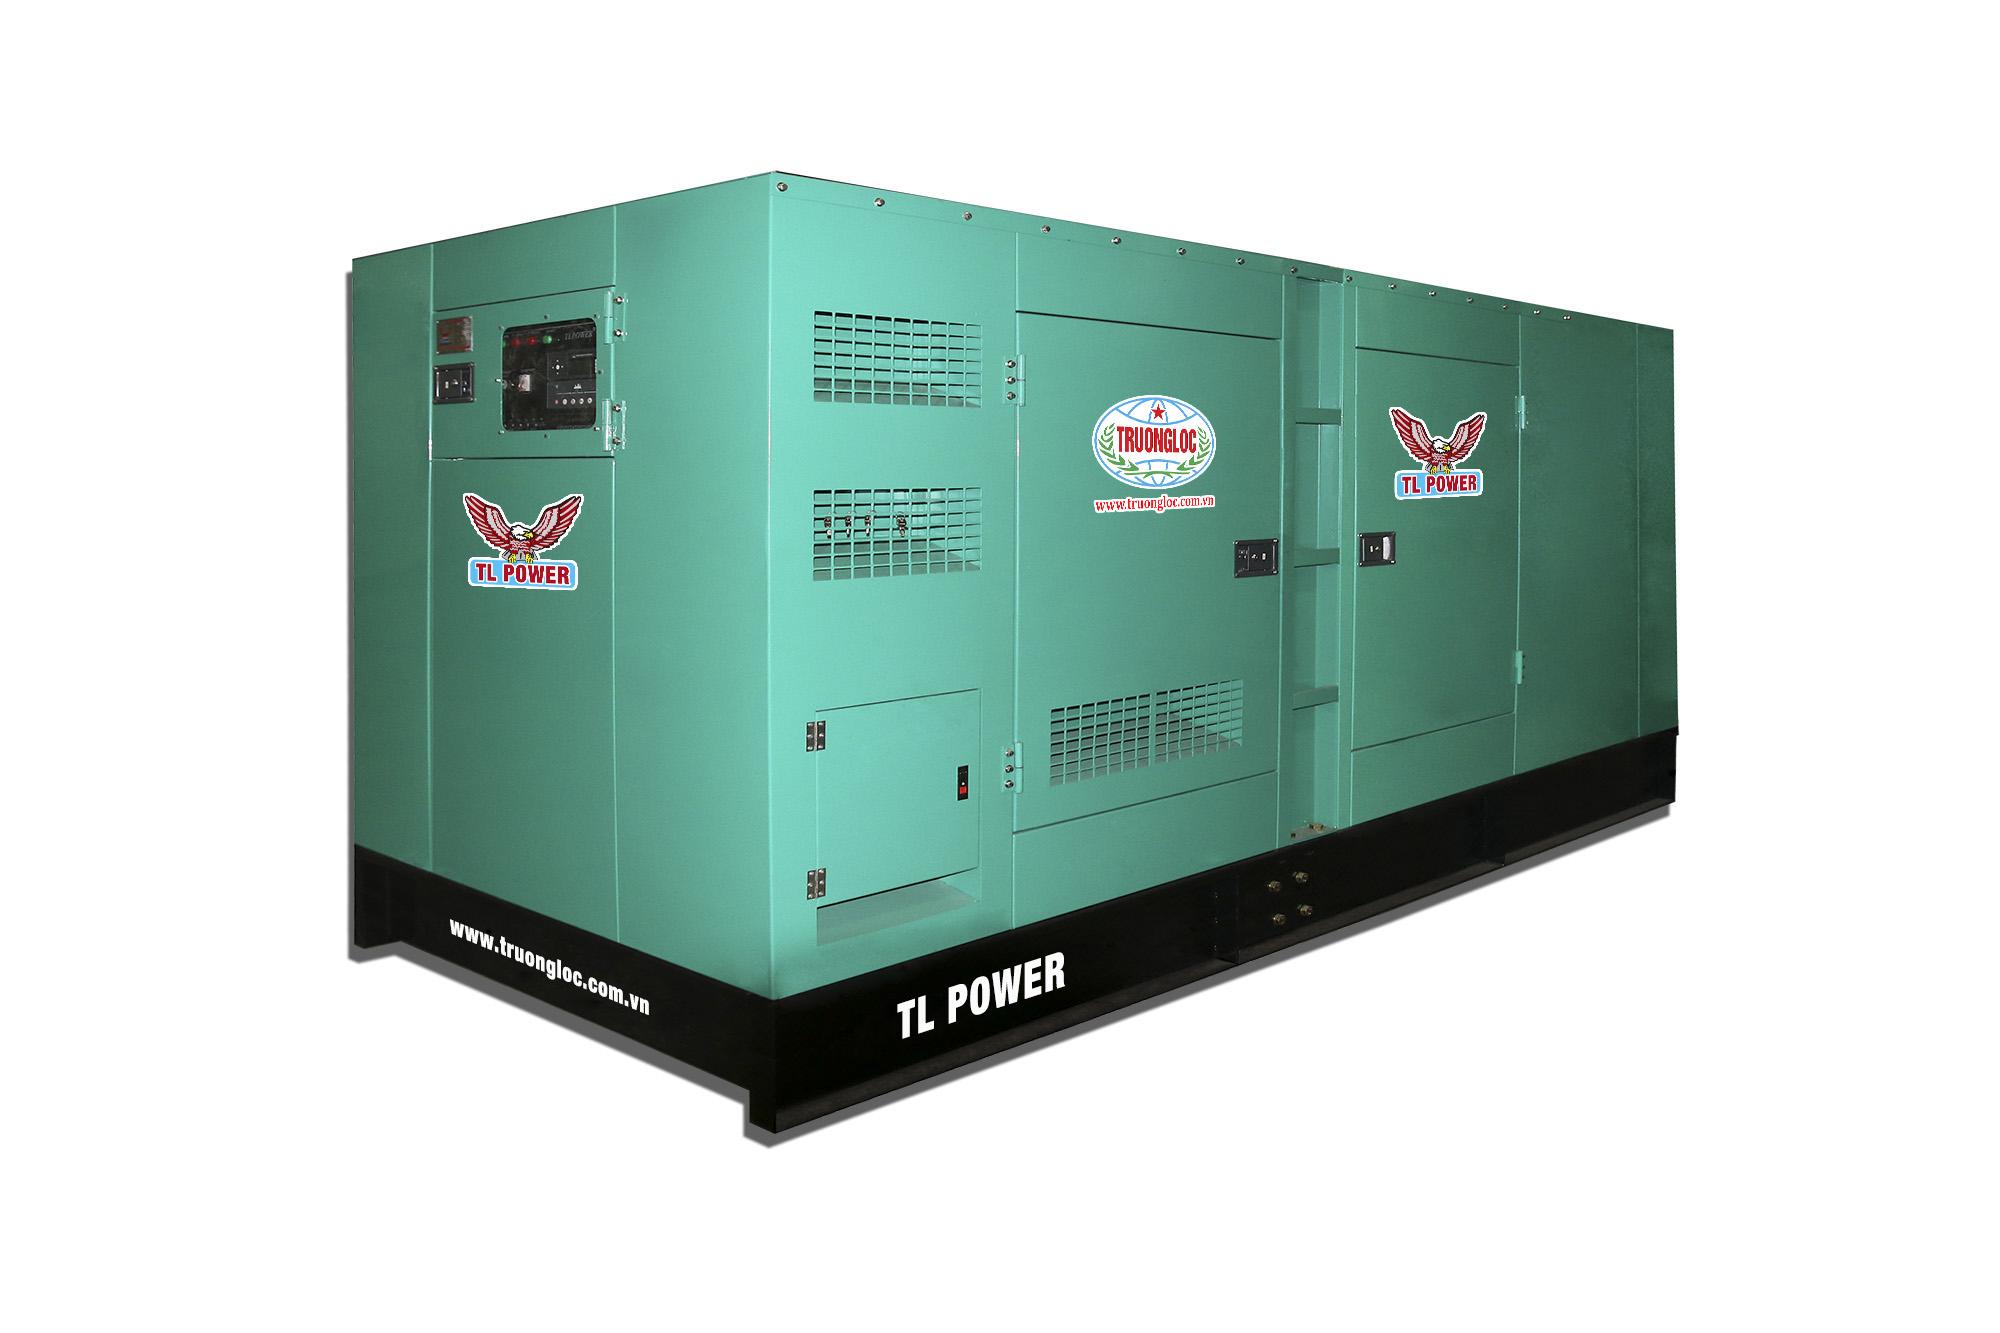 TLPOWER TP33-LS - PERKINS ENGINE